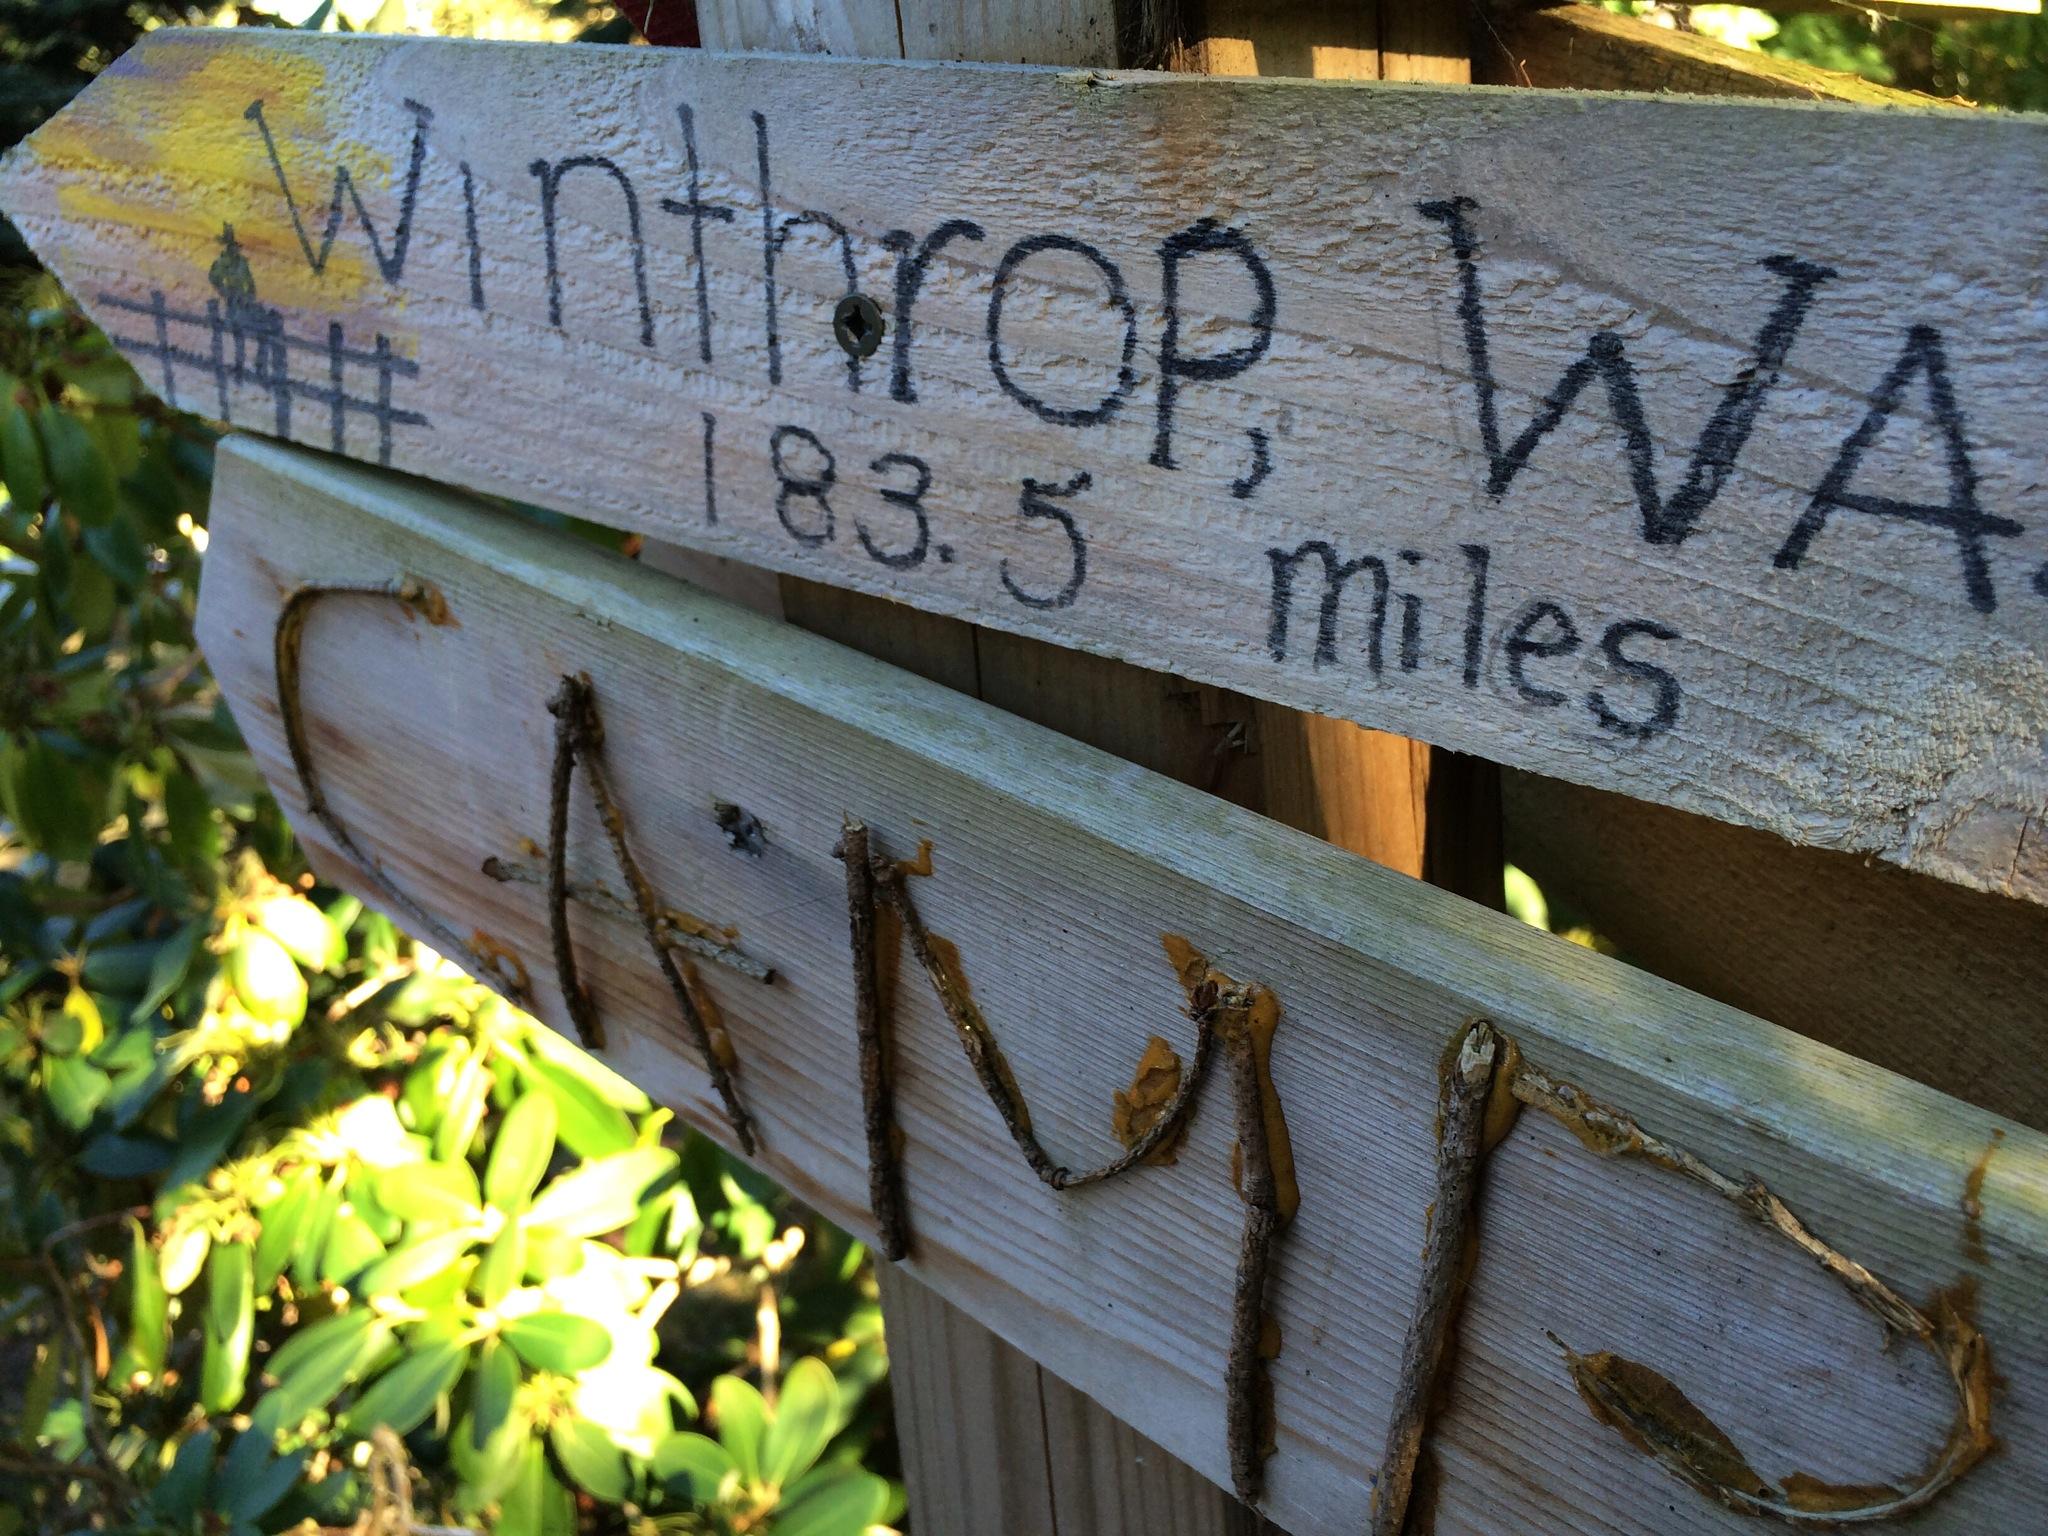 Winthrop_Sign